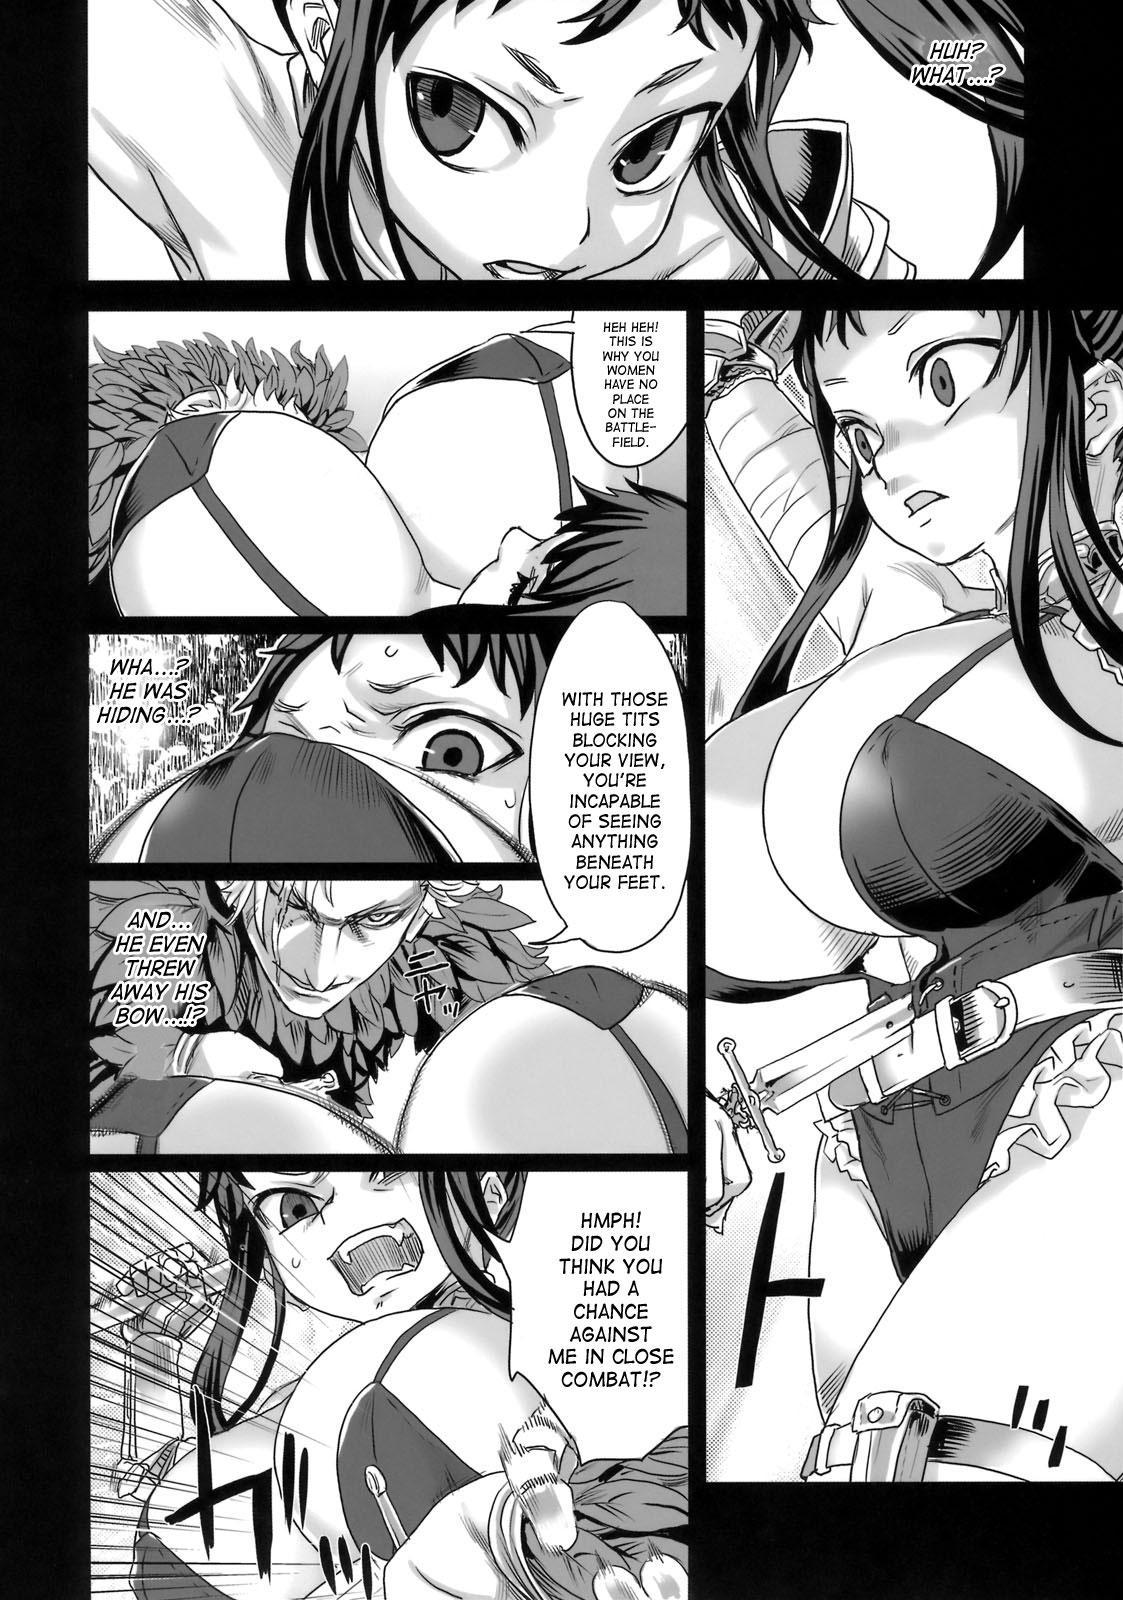 (C76) [Fatalpulse (Asanagi)] Victim Girls 7 - Jaku Niku Kyoushoku Dog-eat-Bitch (Fantasy Earth Zero) [English] [SaHa] 4